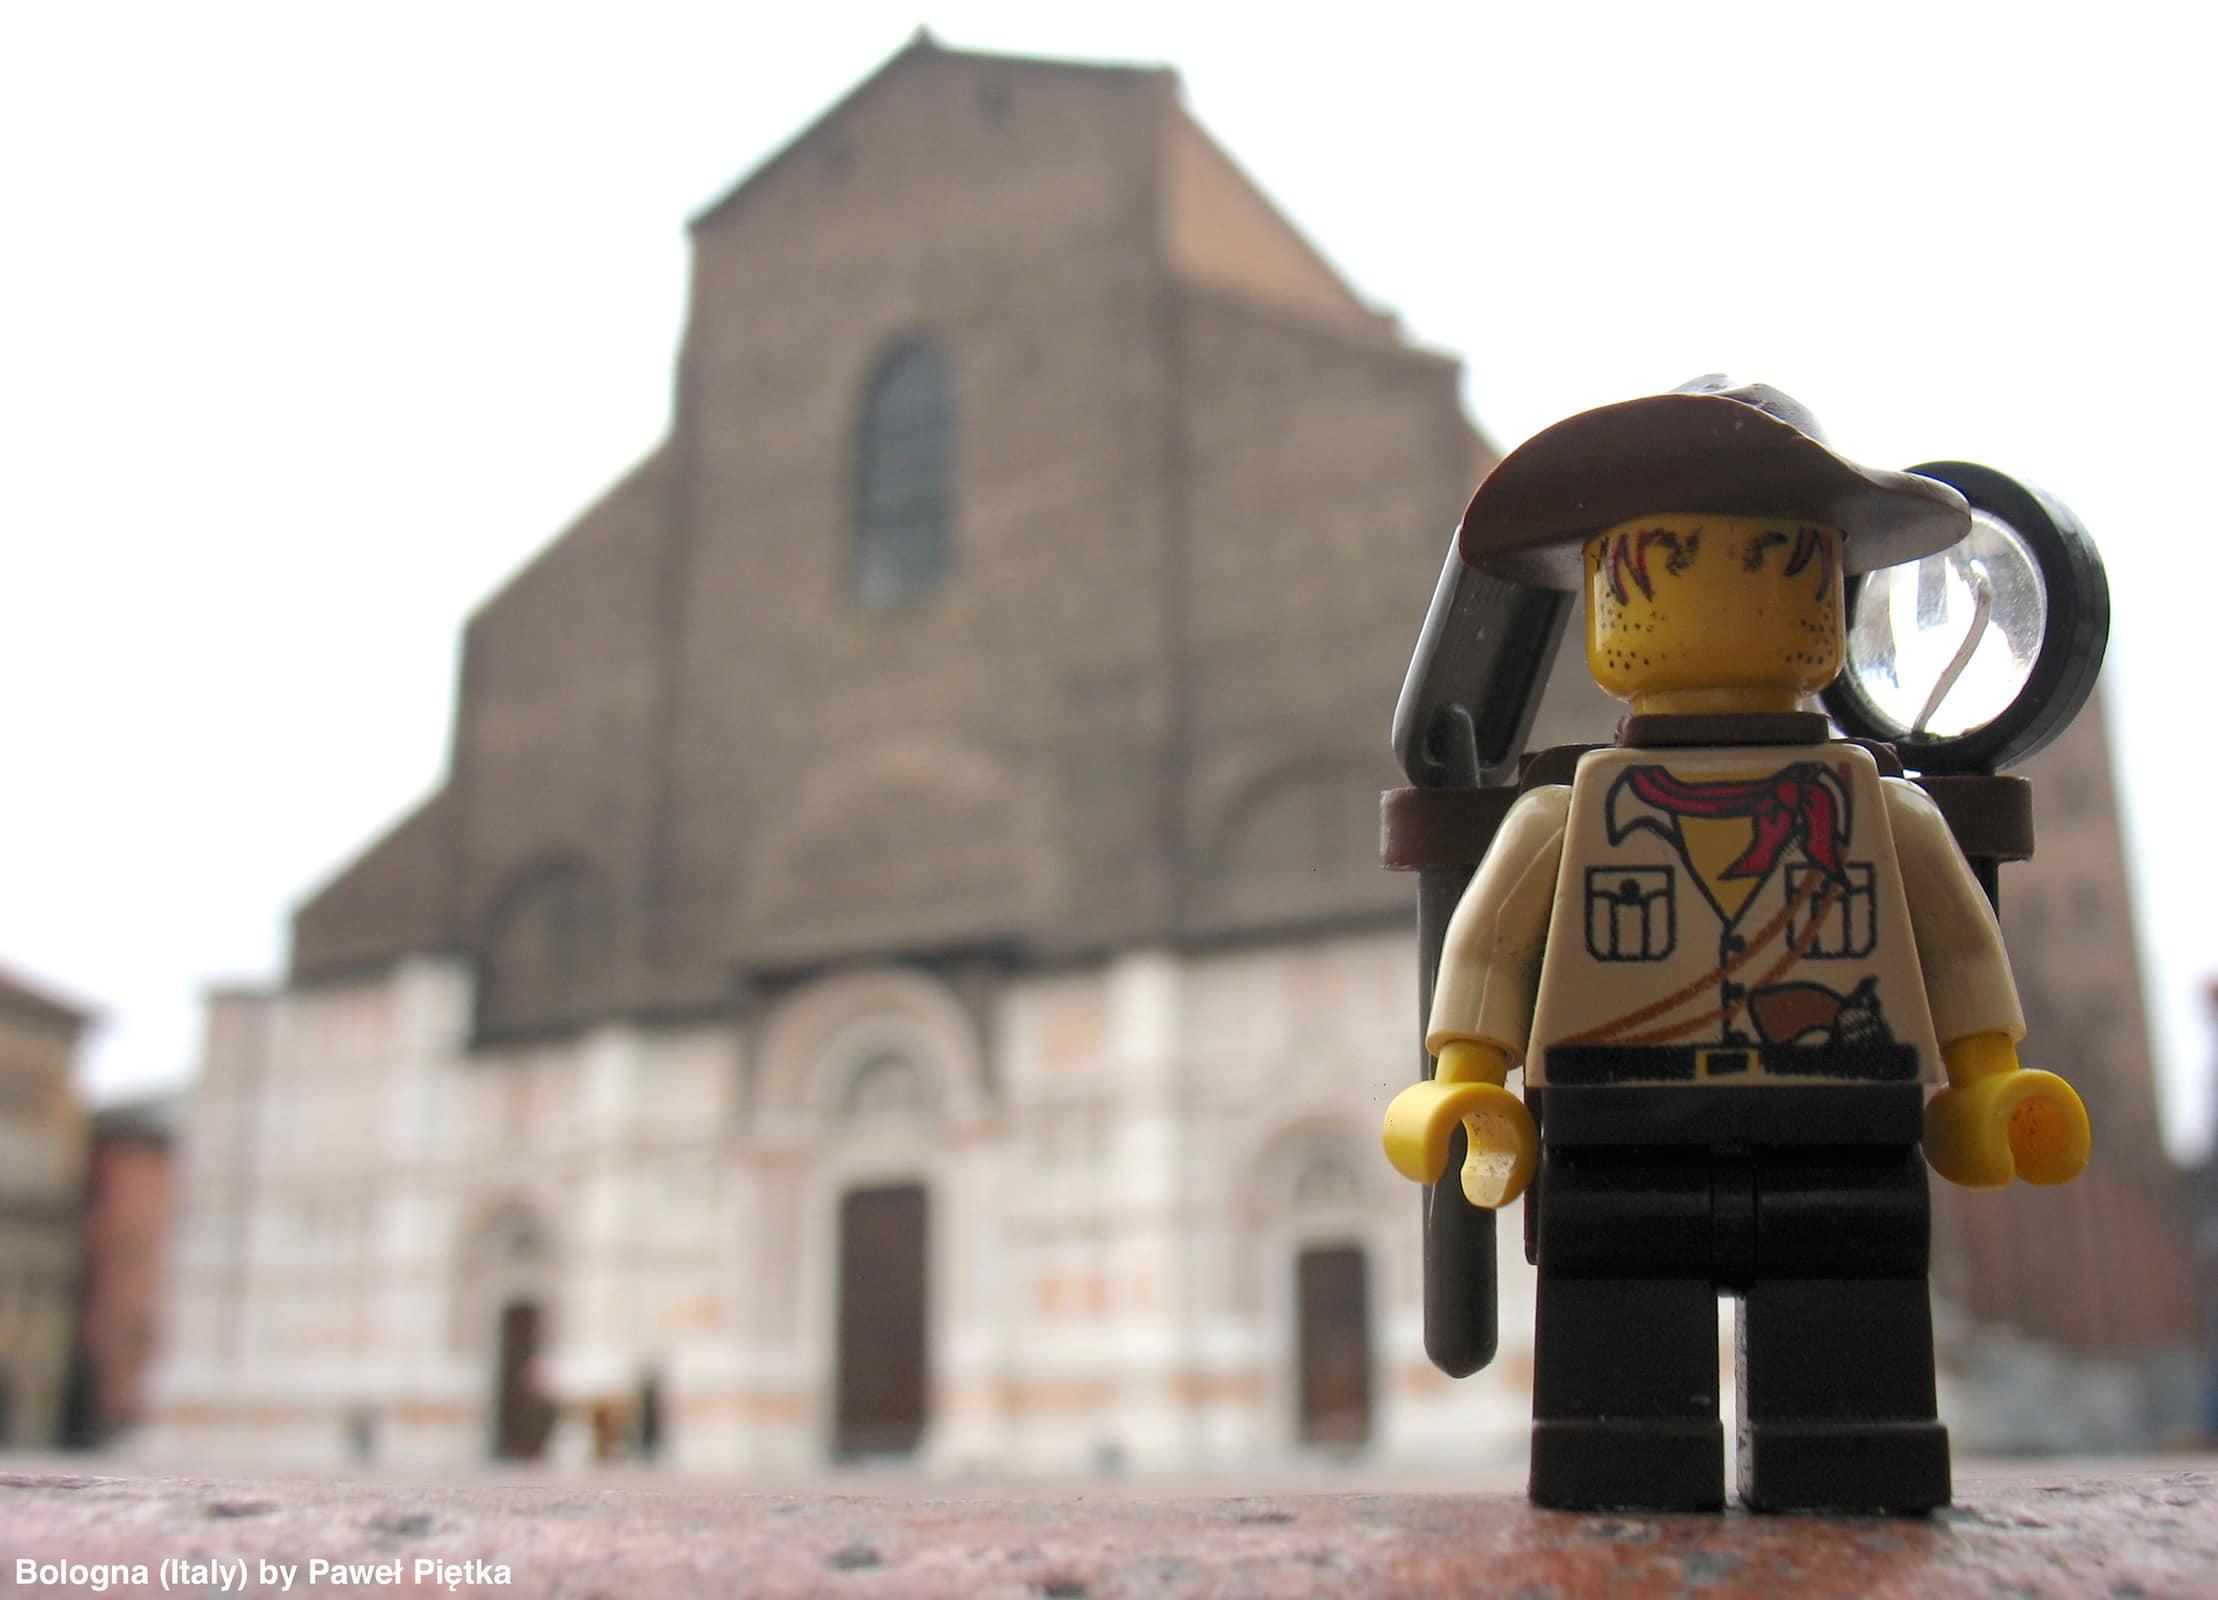 Bologna (Italy) - San Petronio Basilica